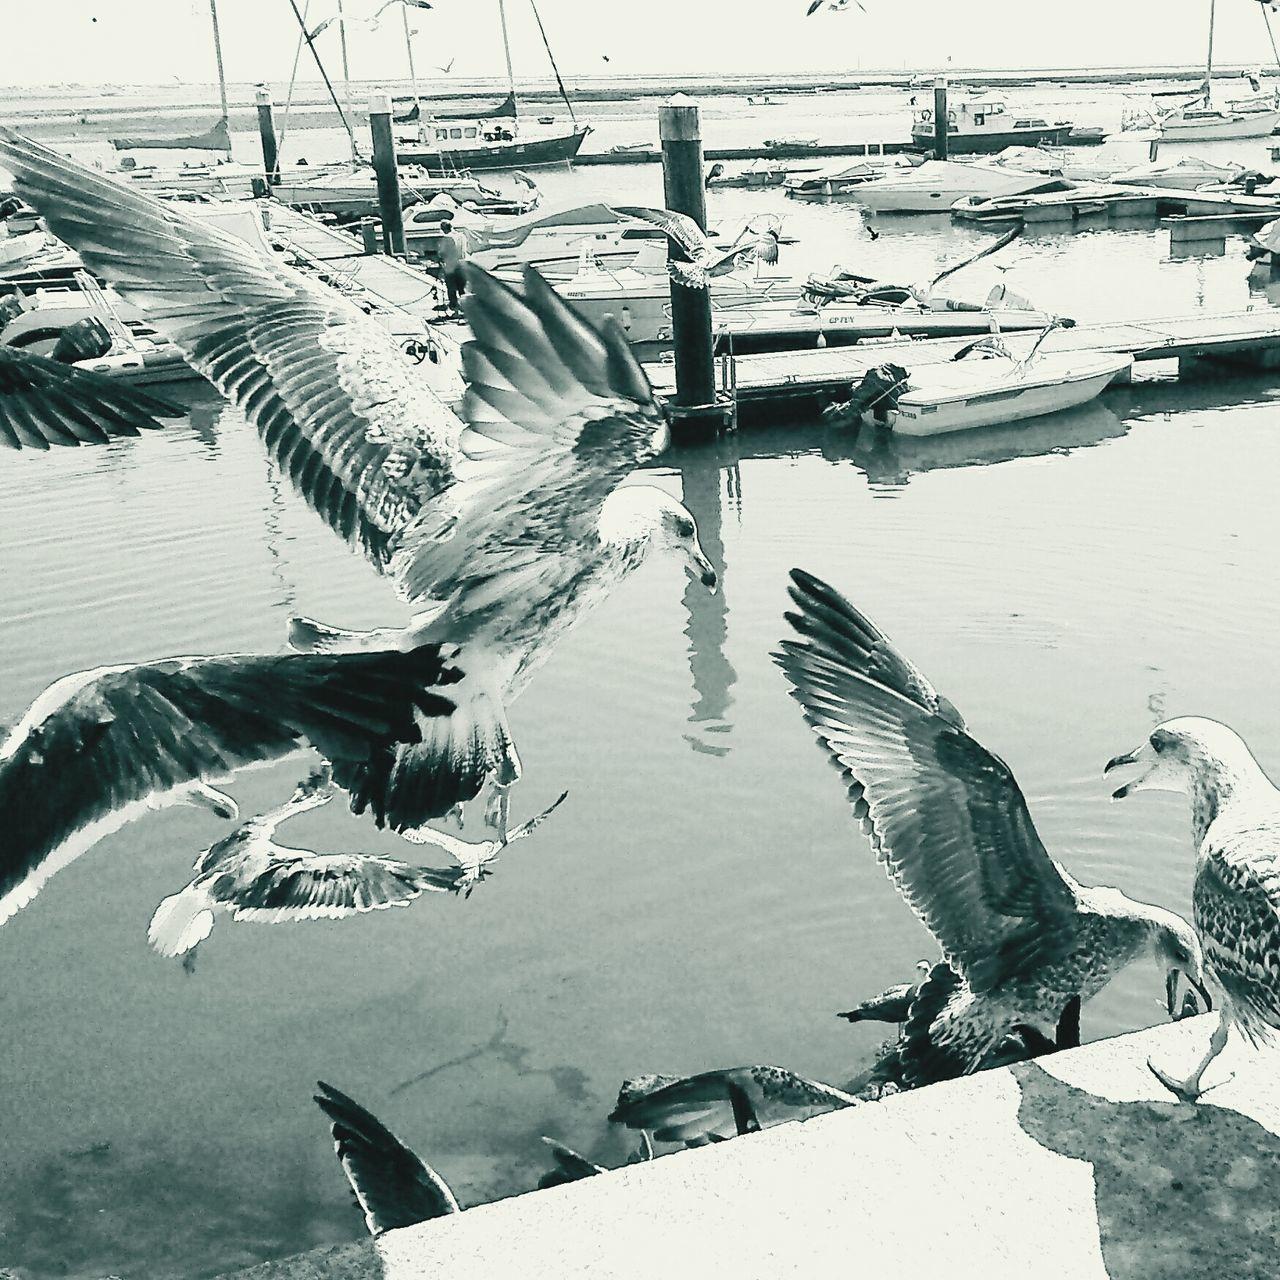 Close-Up Of Seagulls At Harbor